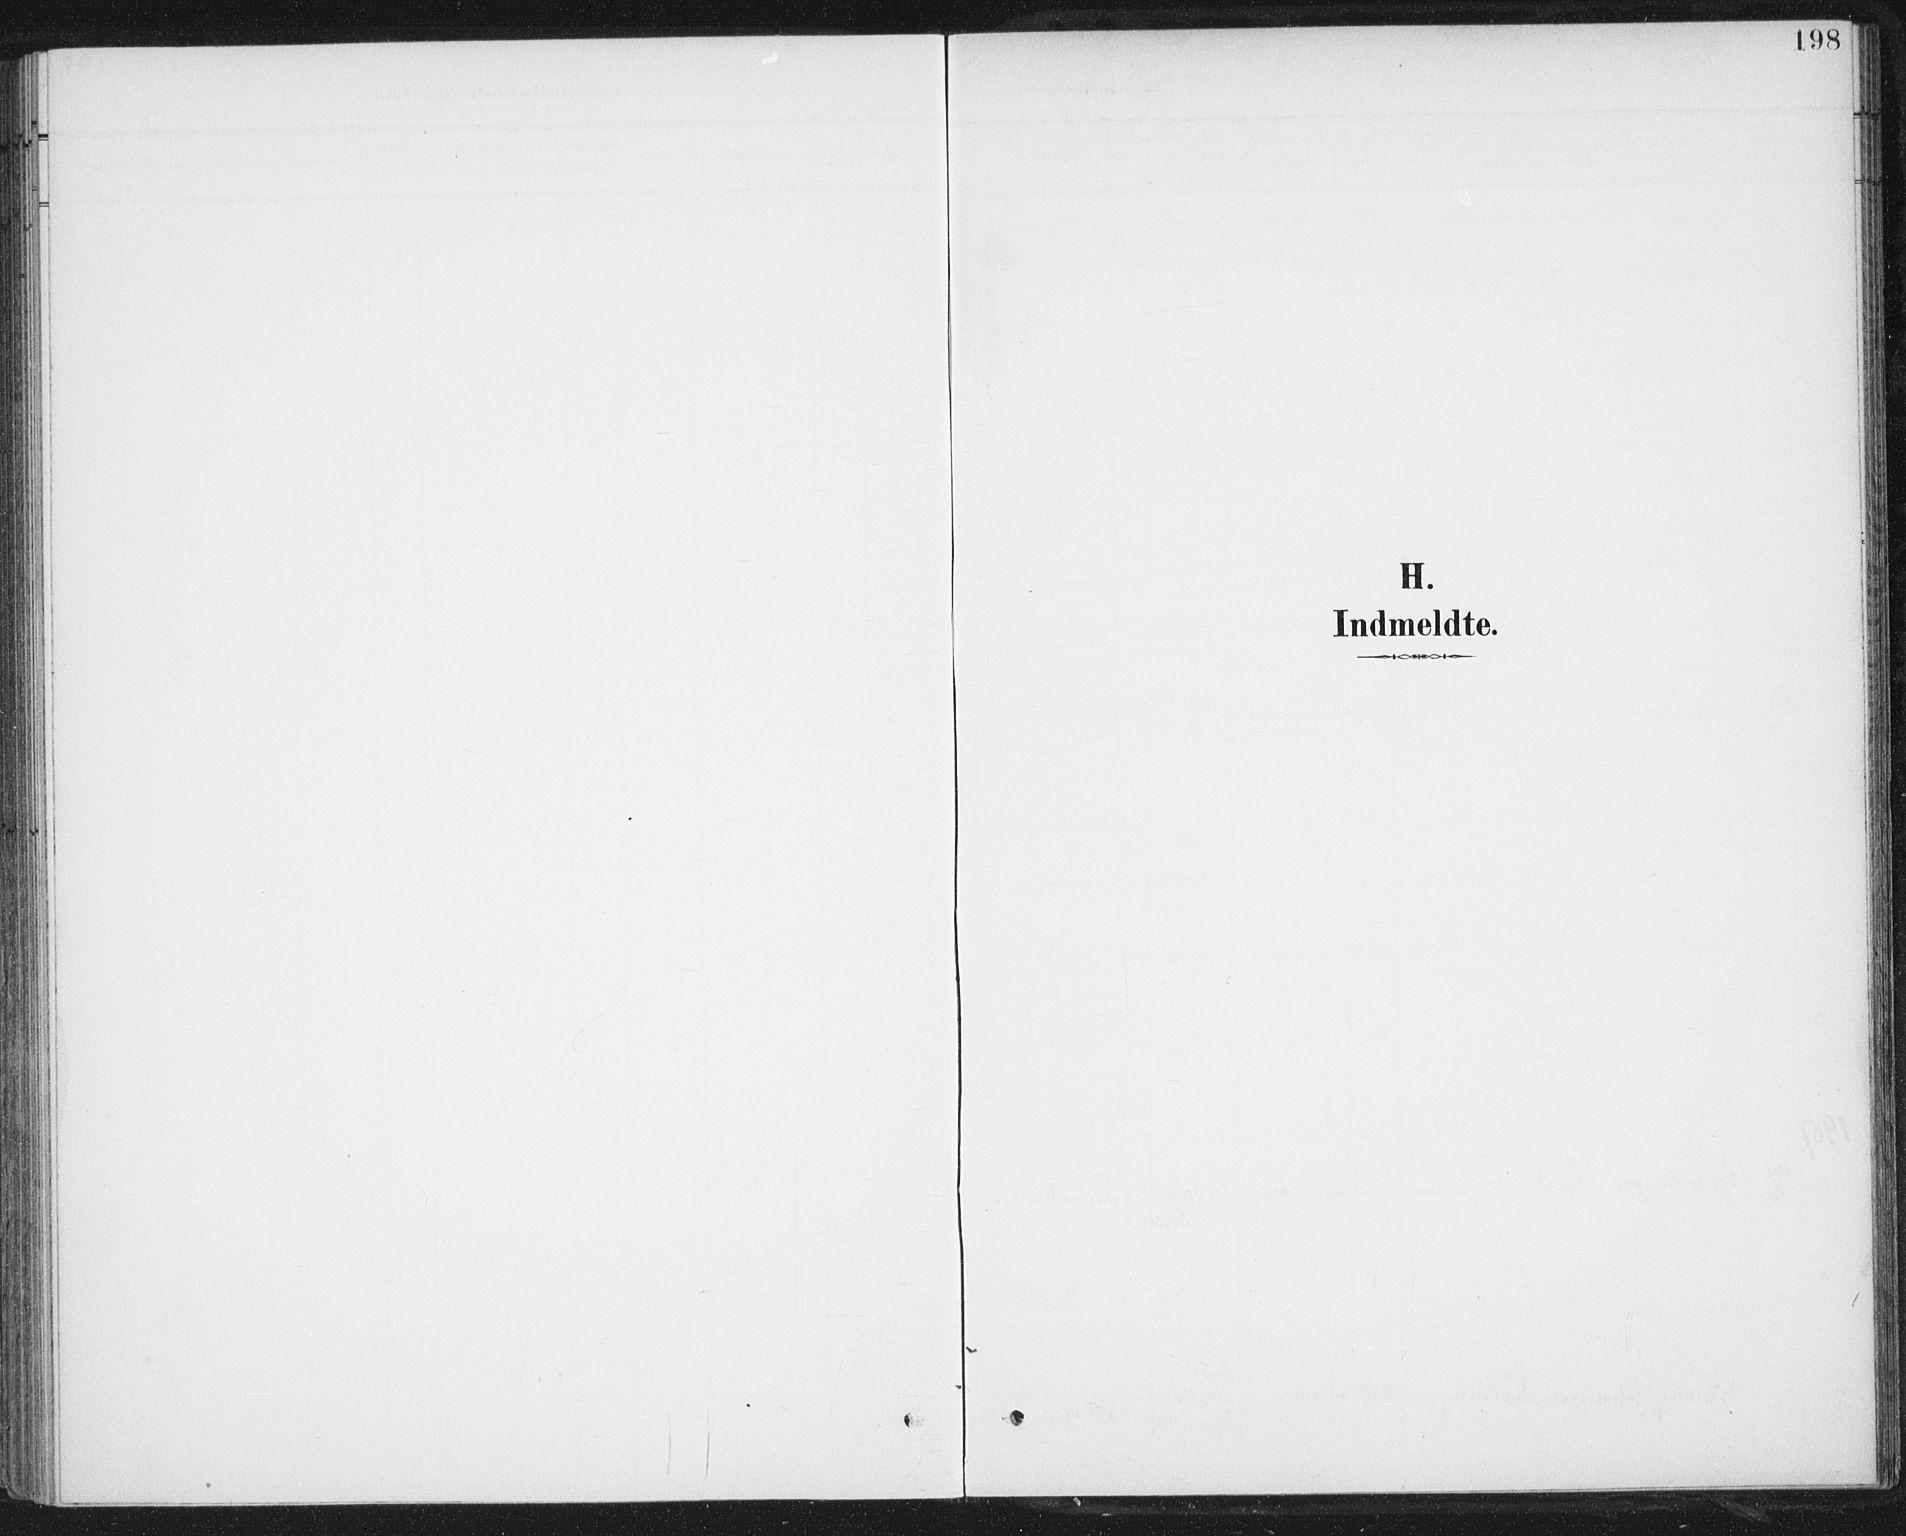 SAT, Ministerialprotokoller, klokkerbøker og fødselsregistre - Nordland, 899/L1437: Ministerialbok nr. 899A05, 1897-1908, s. 198